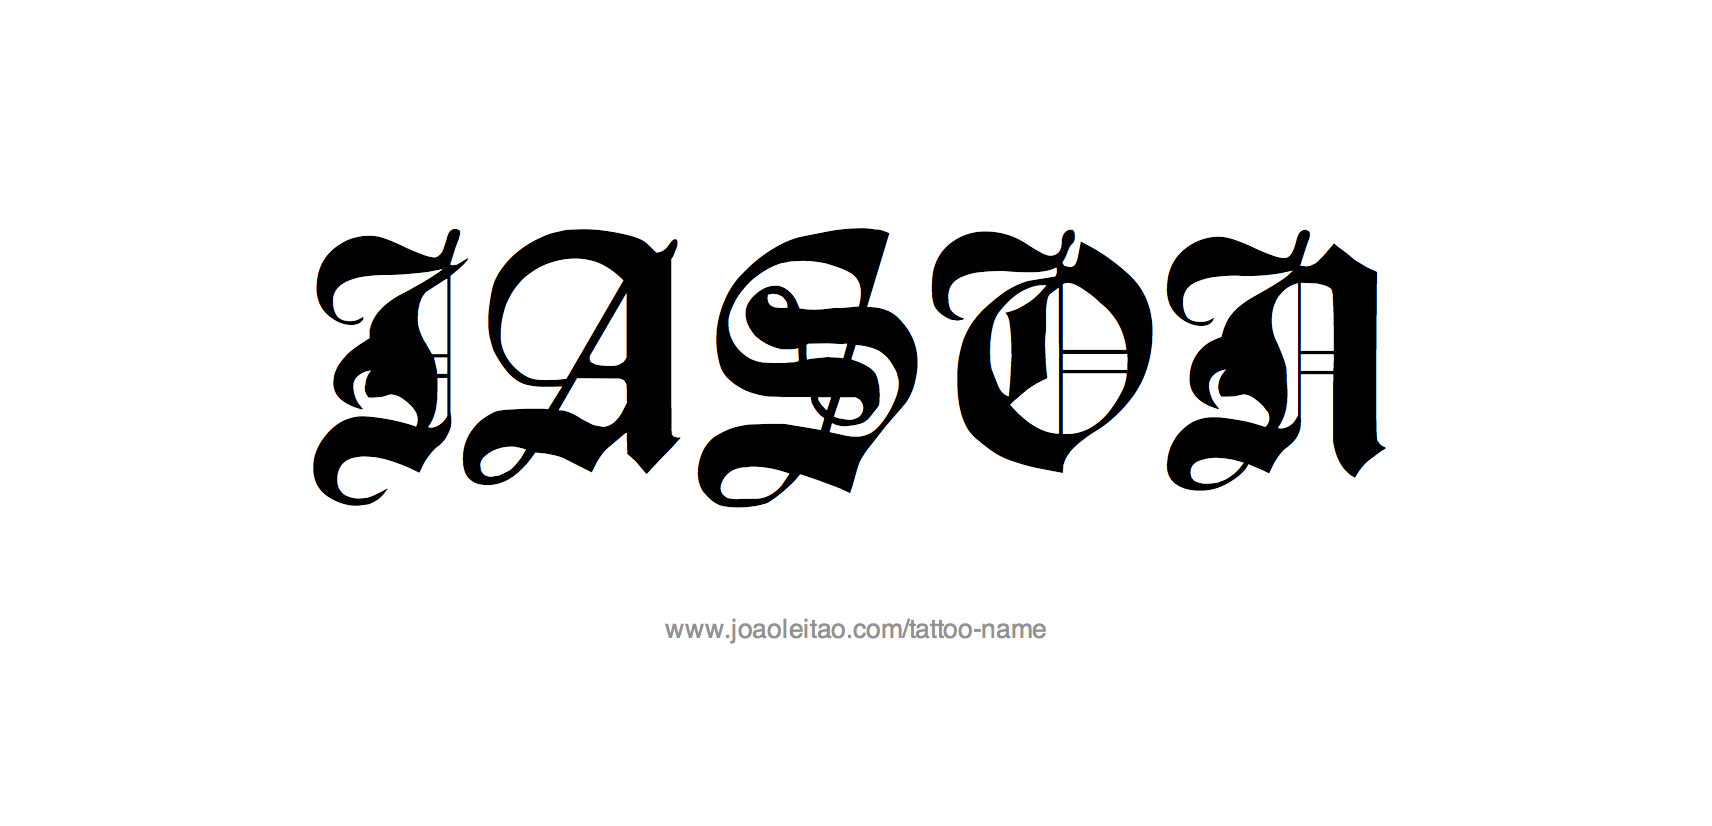 Jason Name Tattoo Designs Name Tattoo Designs Name Tattoos Name Tattoo